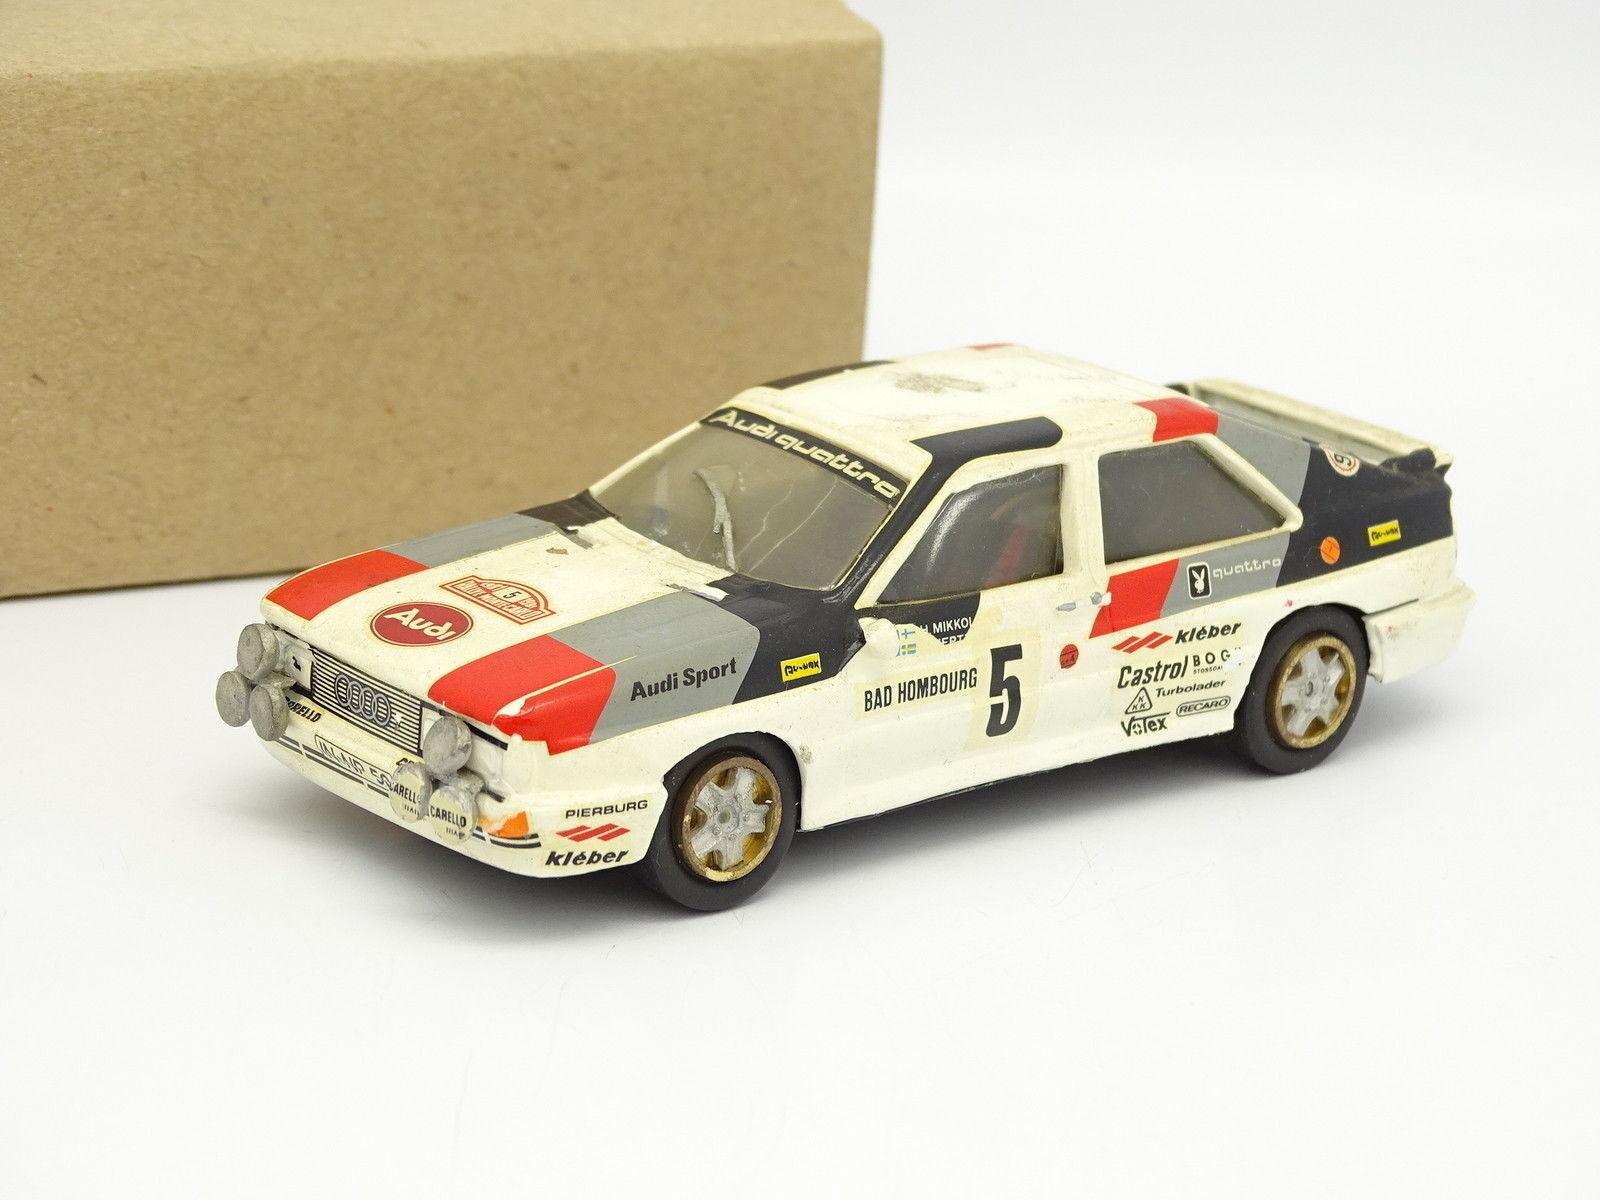 AMR Set aufgebaut aufgebaut aufgebaut Metall 1 43 - Audi Quattro Rallye Aufbau Carlo 1981 Nr.5 076763